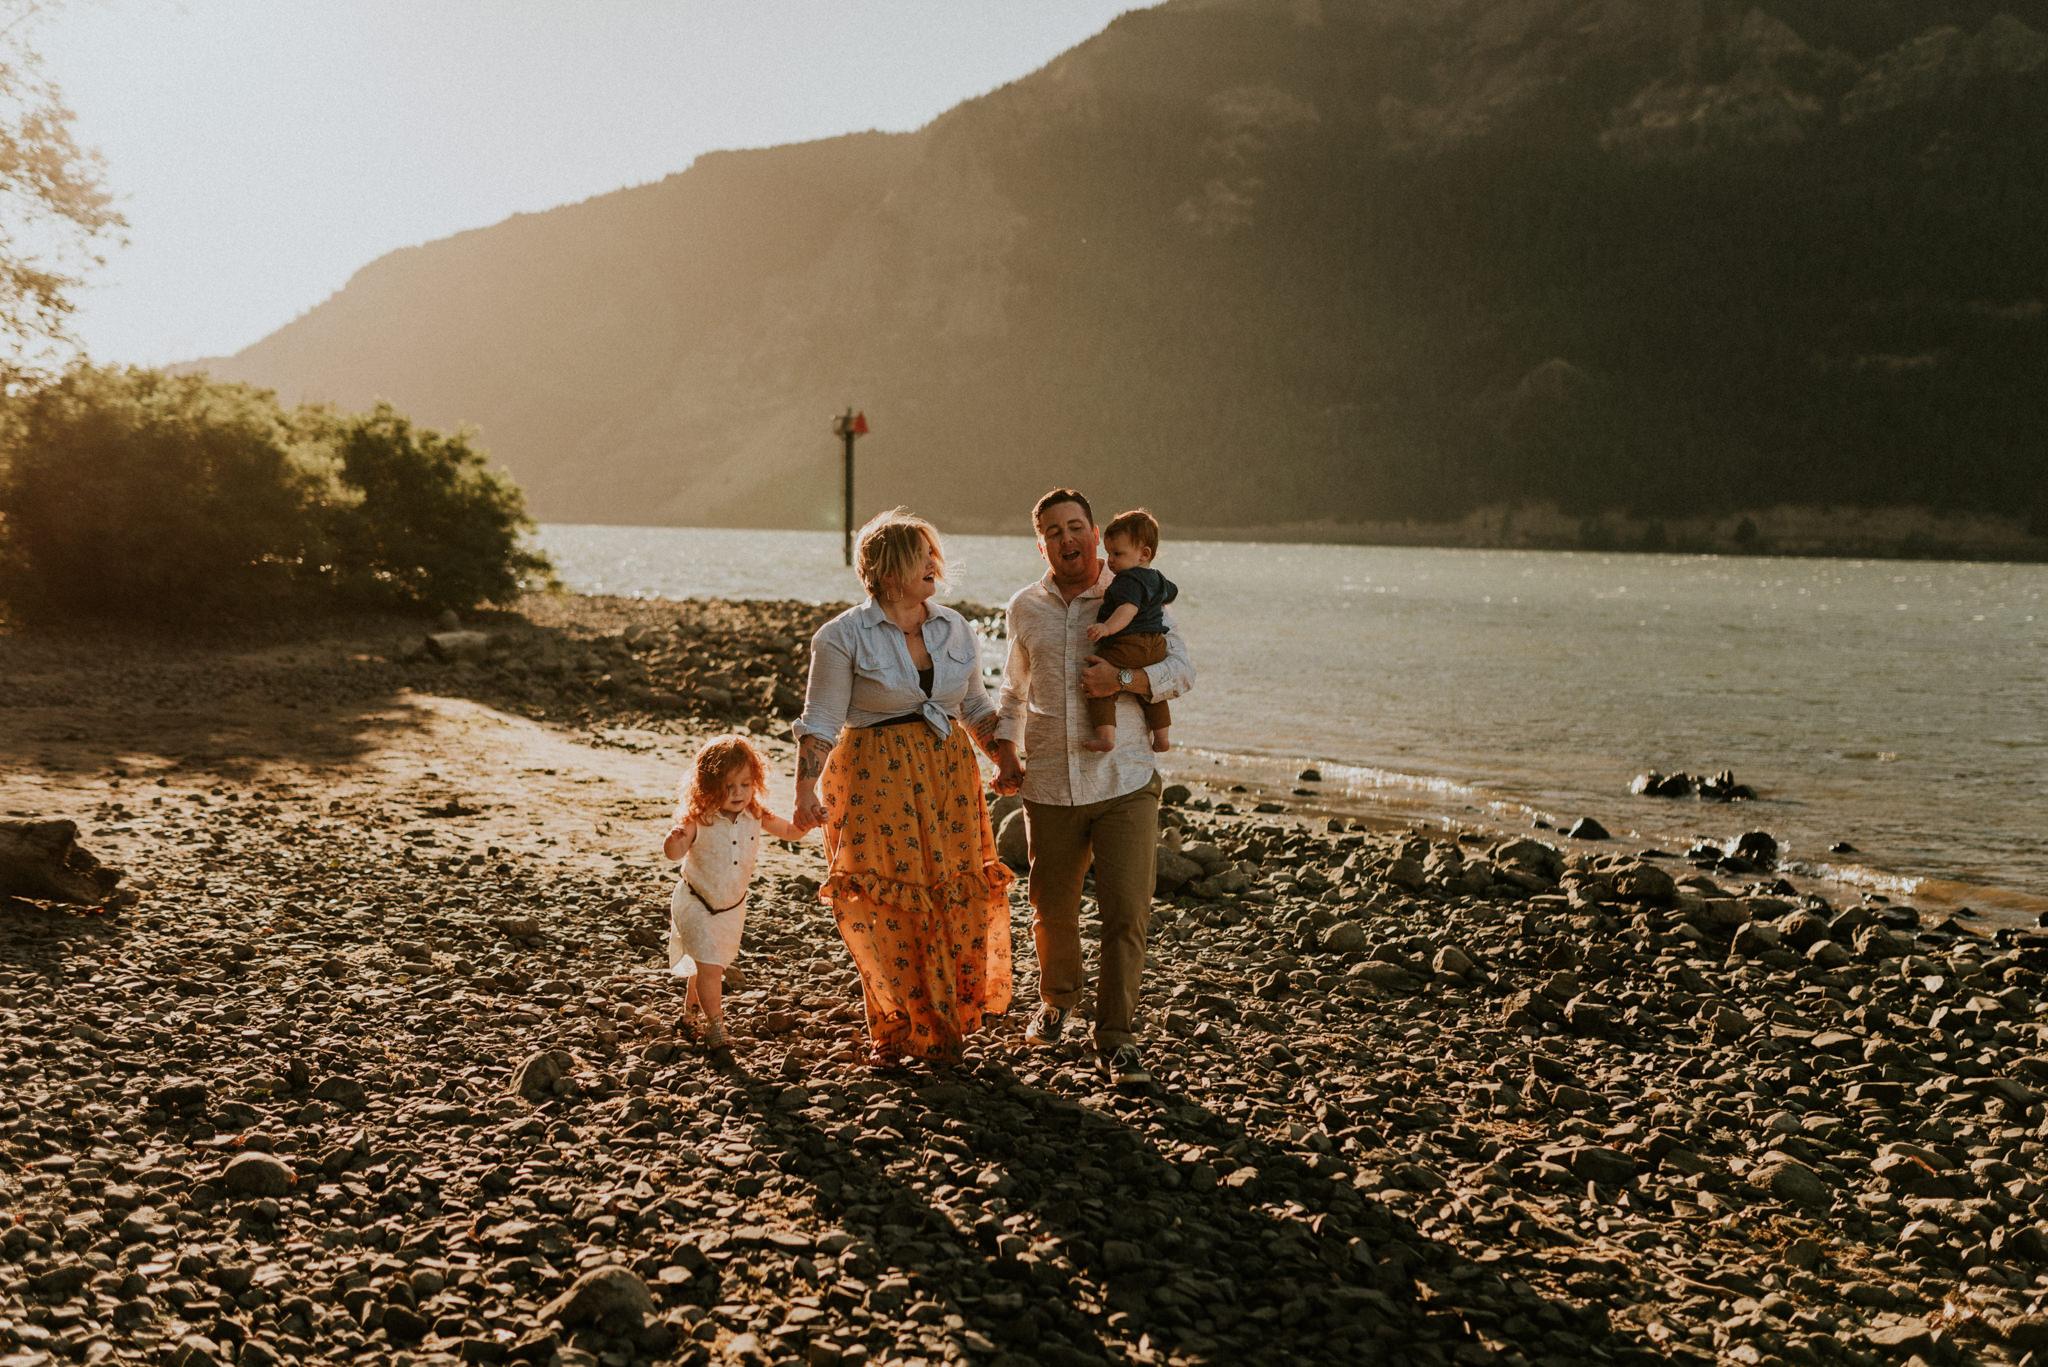 Kerlyn-Van-Gelder-Photography-Texas-Photographer46.jpgColumbia-River-Gorge-Adventurous-Intimate-Family-Session-Kerlyn-Van-Gelder-Photography-Portland-Oregon-Family-Photographer